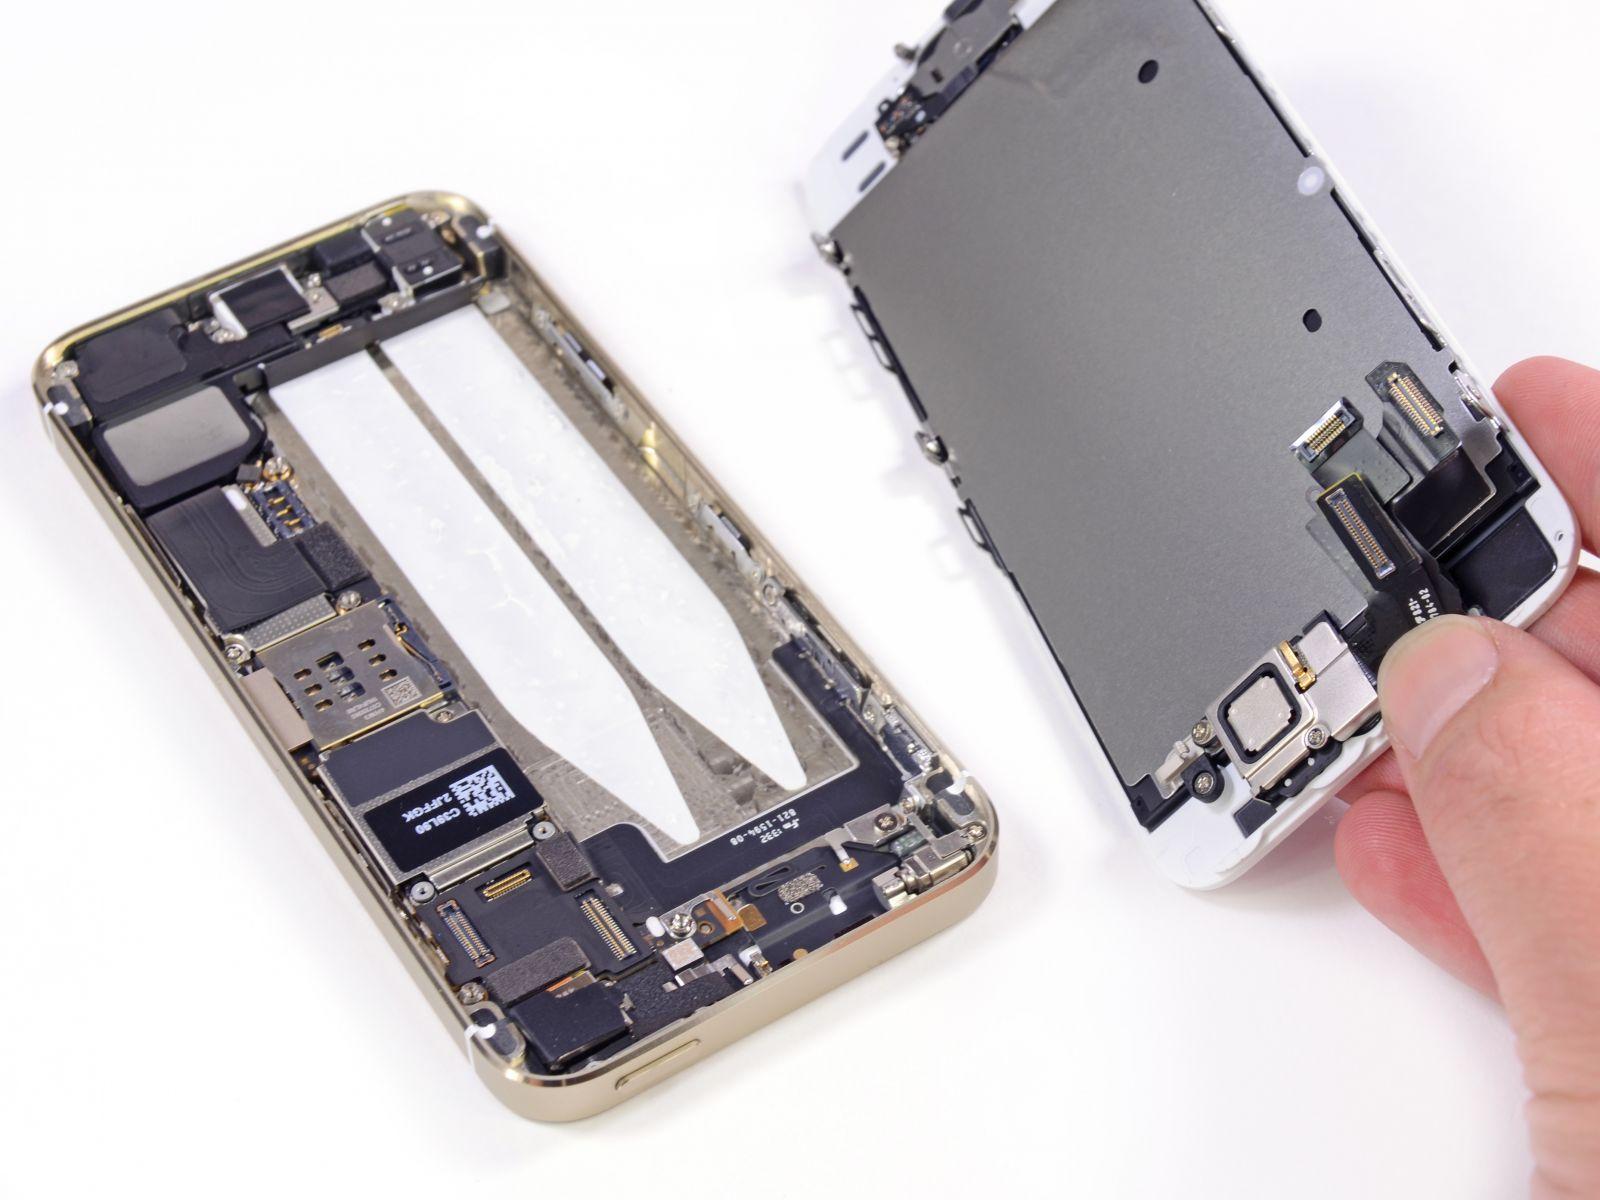 kak-razobrat-iphone-5s-22